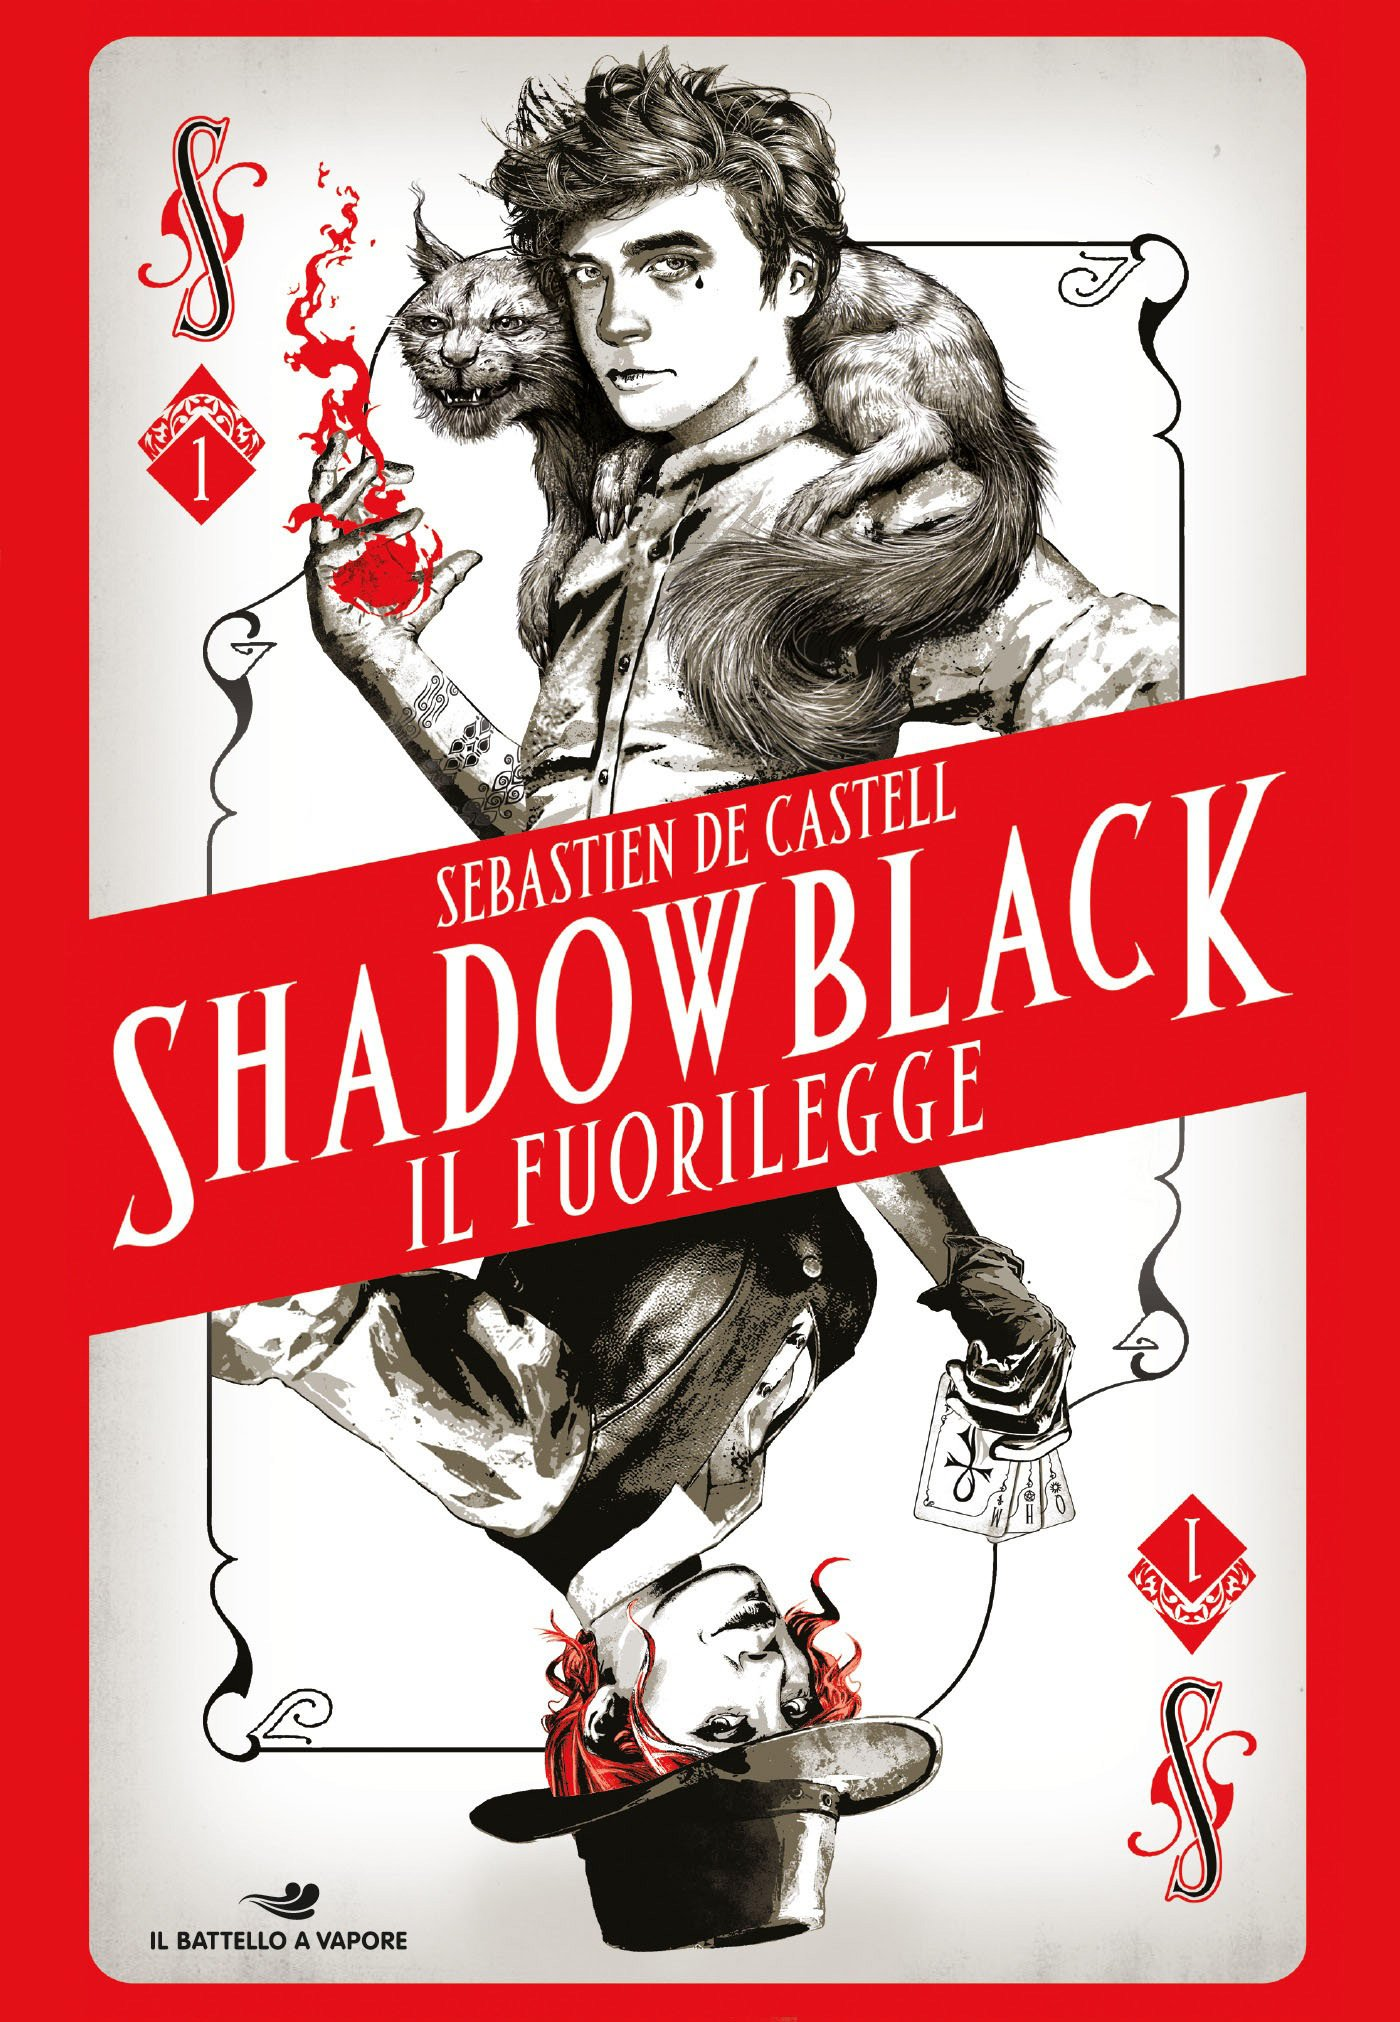 Il fuorilegge. Shadowblack Copertina flessibile – 30 gen 2018 Sebastien De Castell Piemme 8856662639 Fantascienza-fantasy